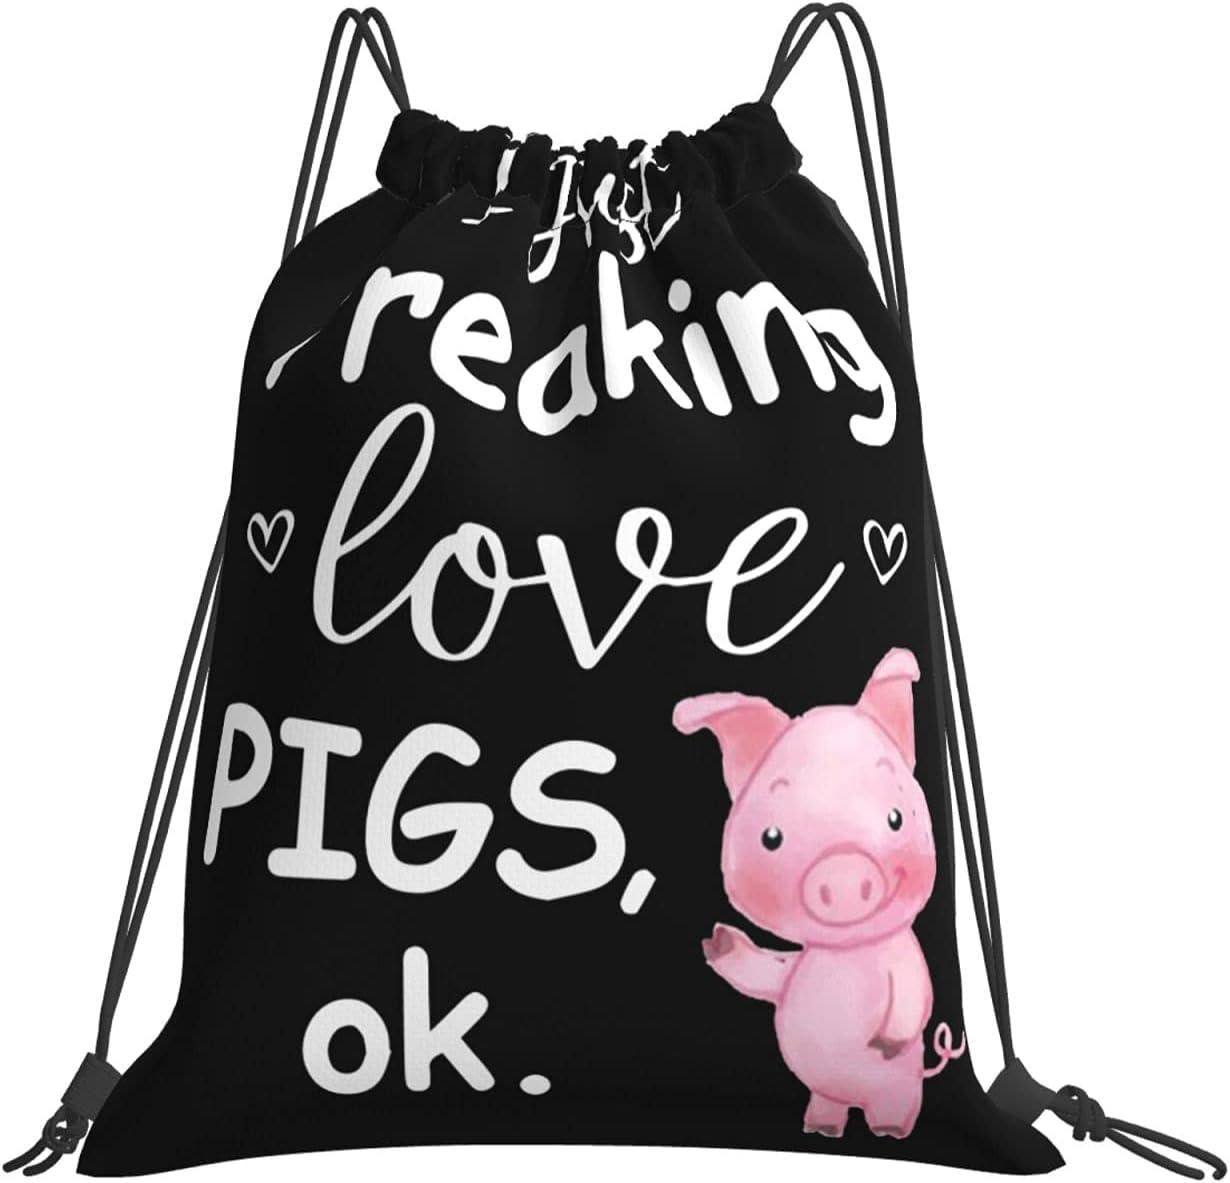 I Gifts Just Freaking Love Pigs Ok Lightweight Bag Men For Drawstring Virginia Beach Mall